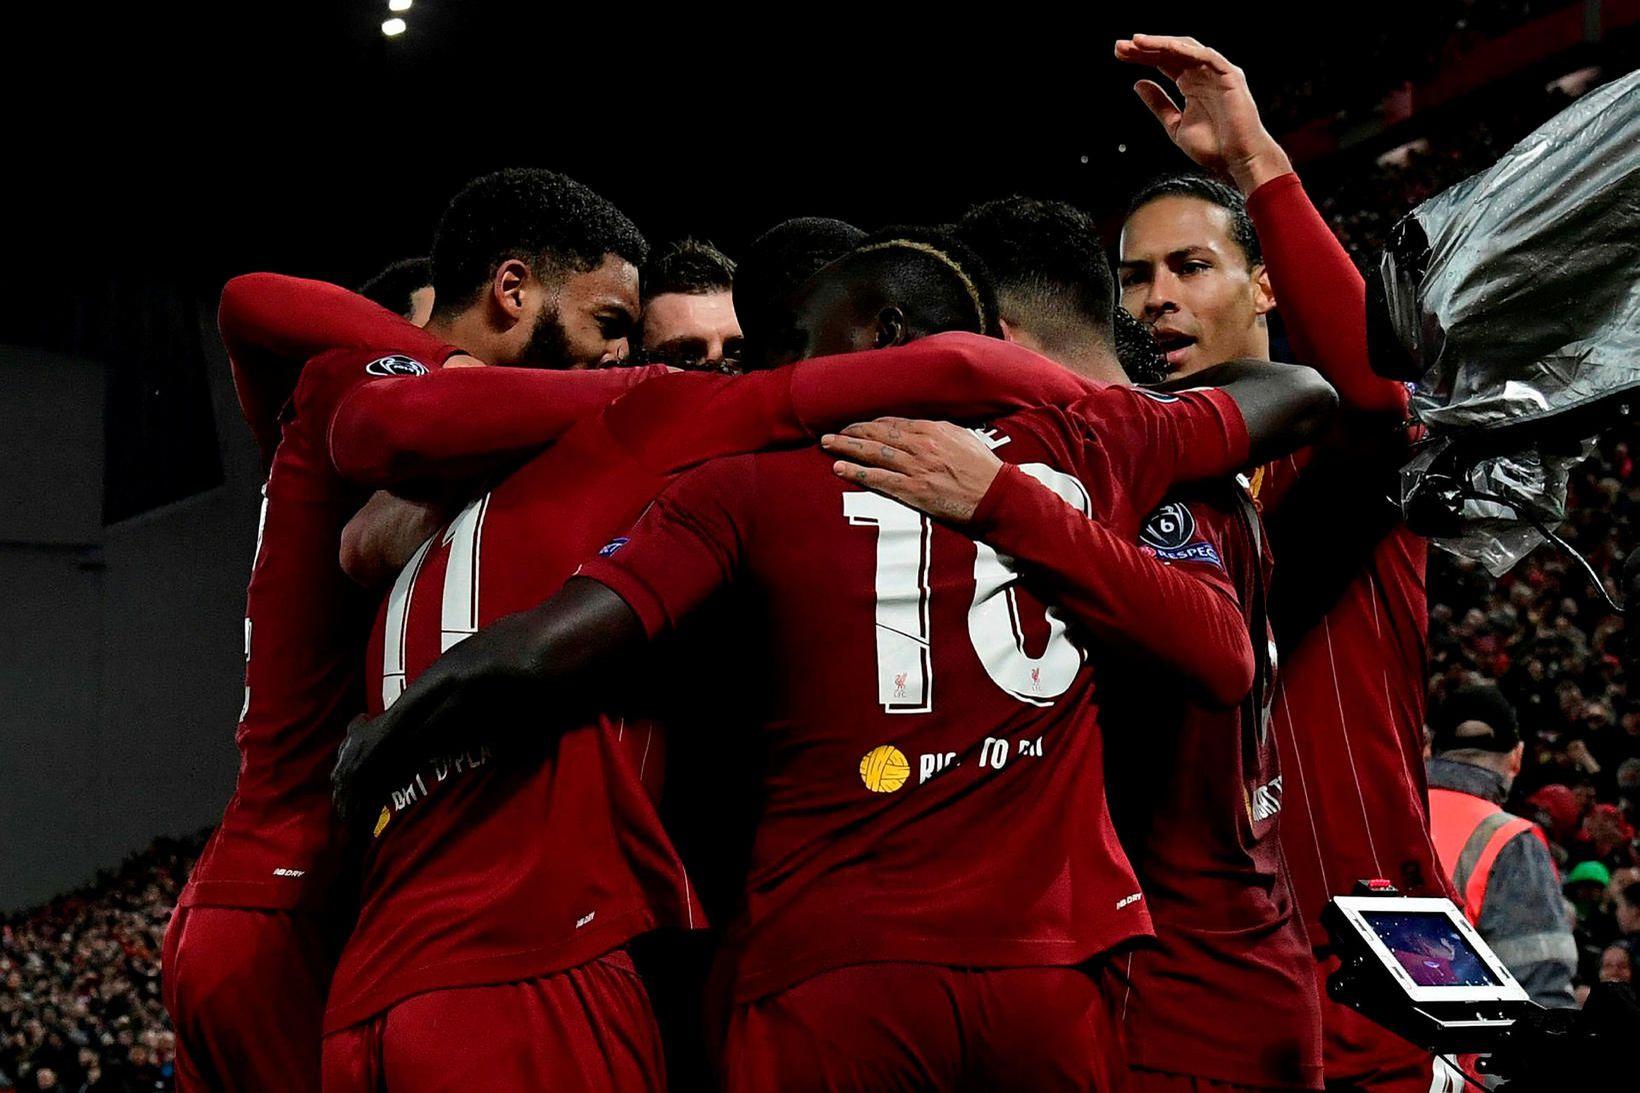 Leikmenn Liverpool fagna.